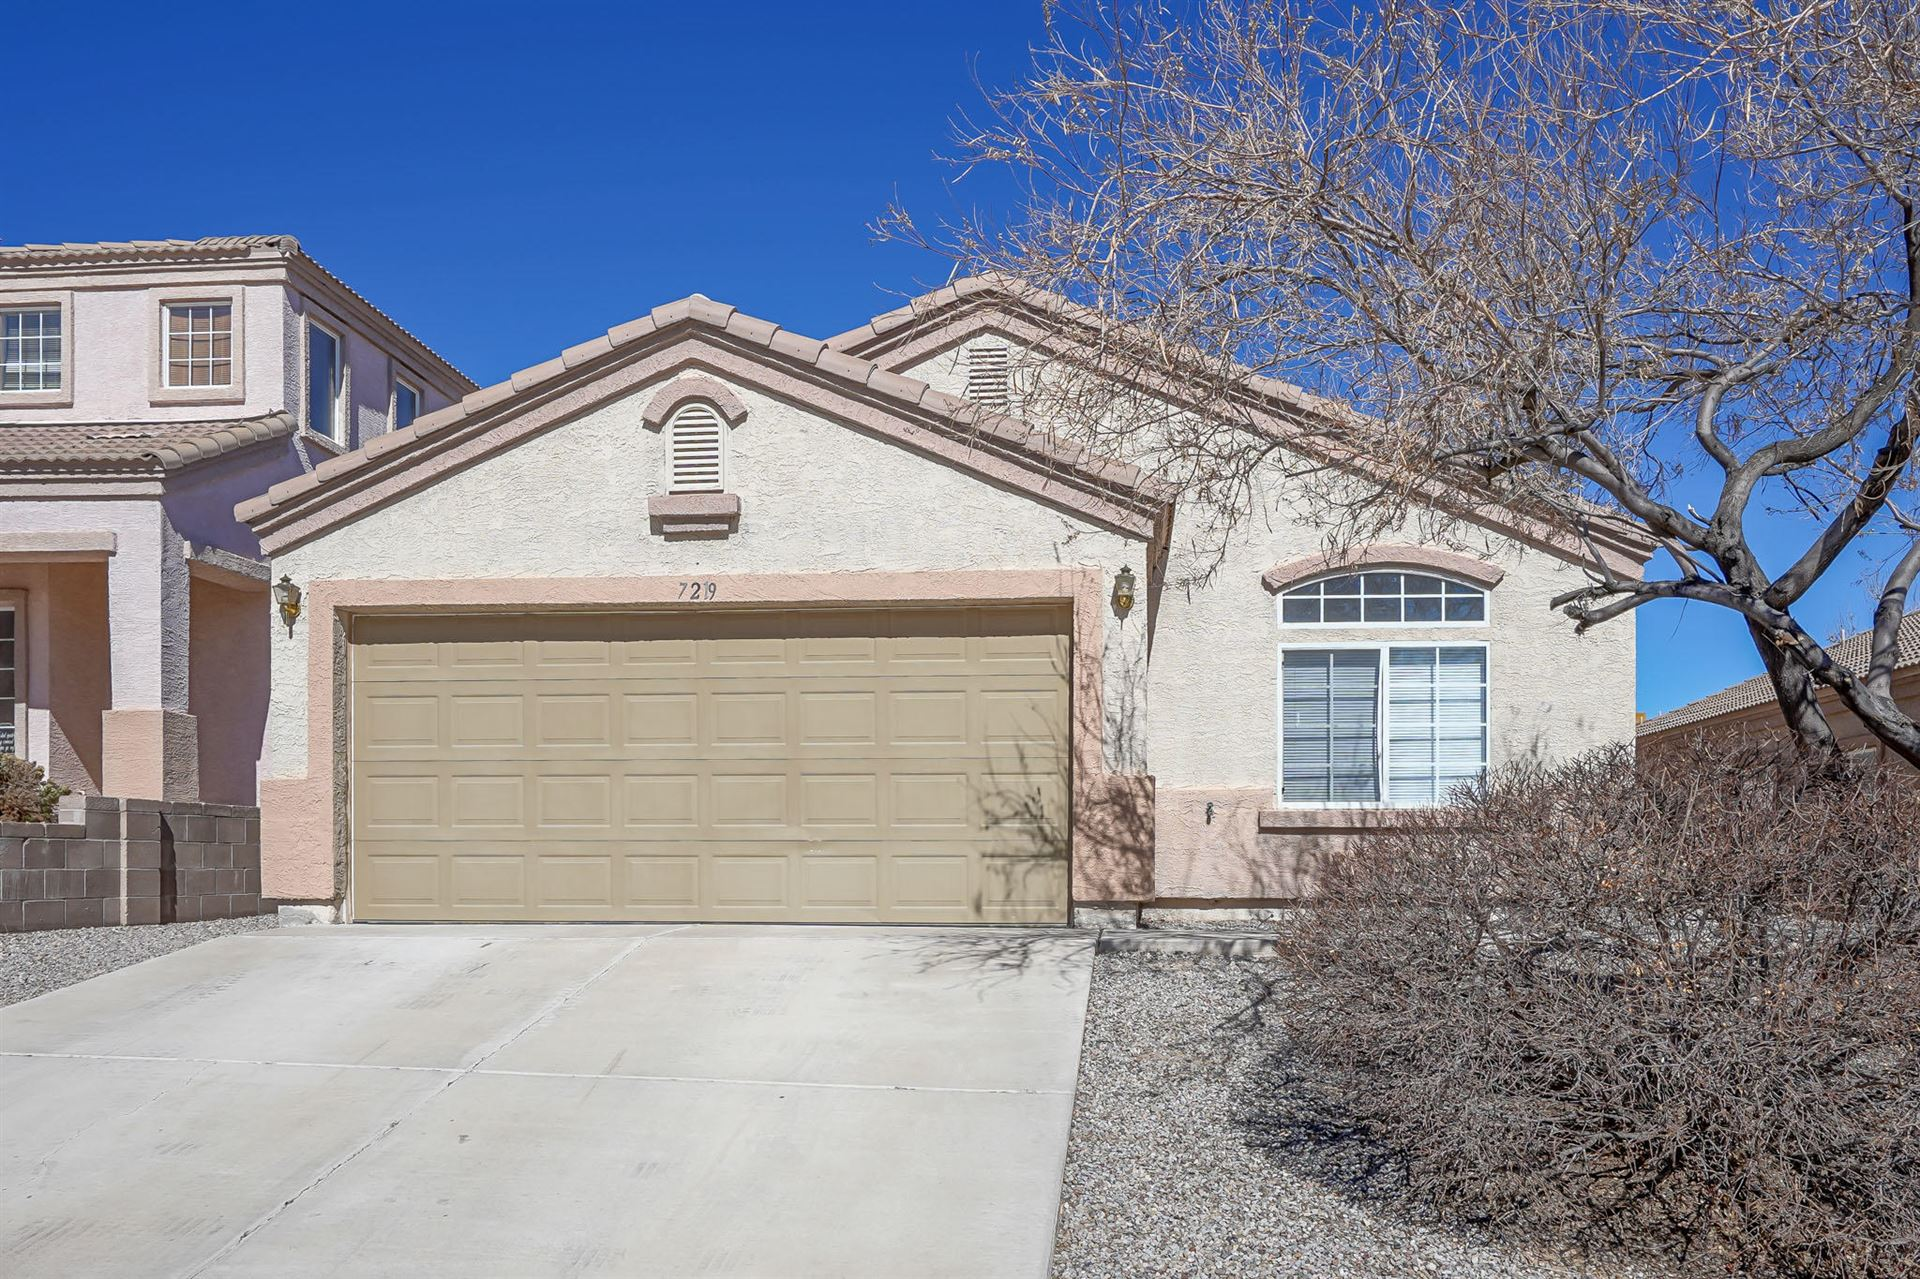 7219 Teypana Road NW, Albuquerque, NM 87114 - MLS#: 986337